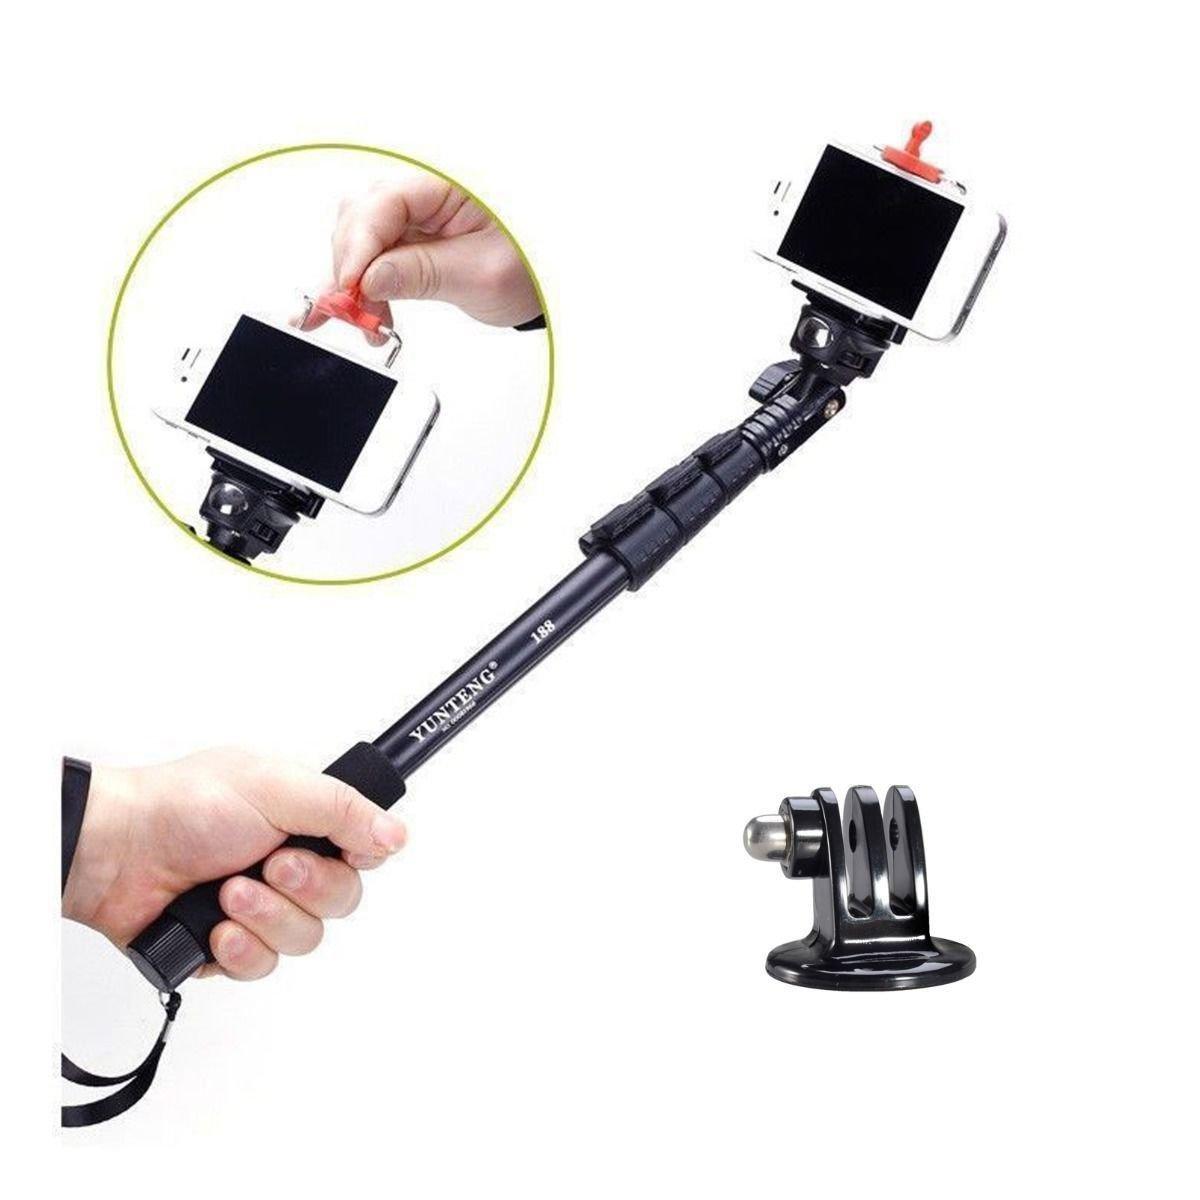 extended selfie monopod handheld stick pole for iphone 6 5s gopro hero 4 3 3 2. Black Bedroom Furniture Sets. Home Design Ideas